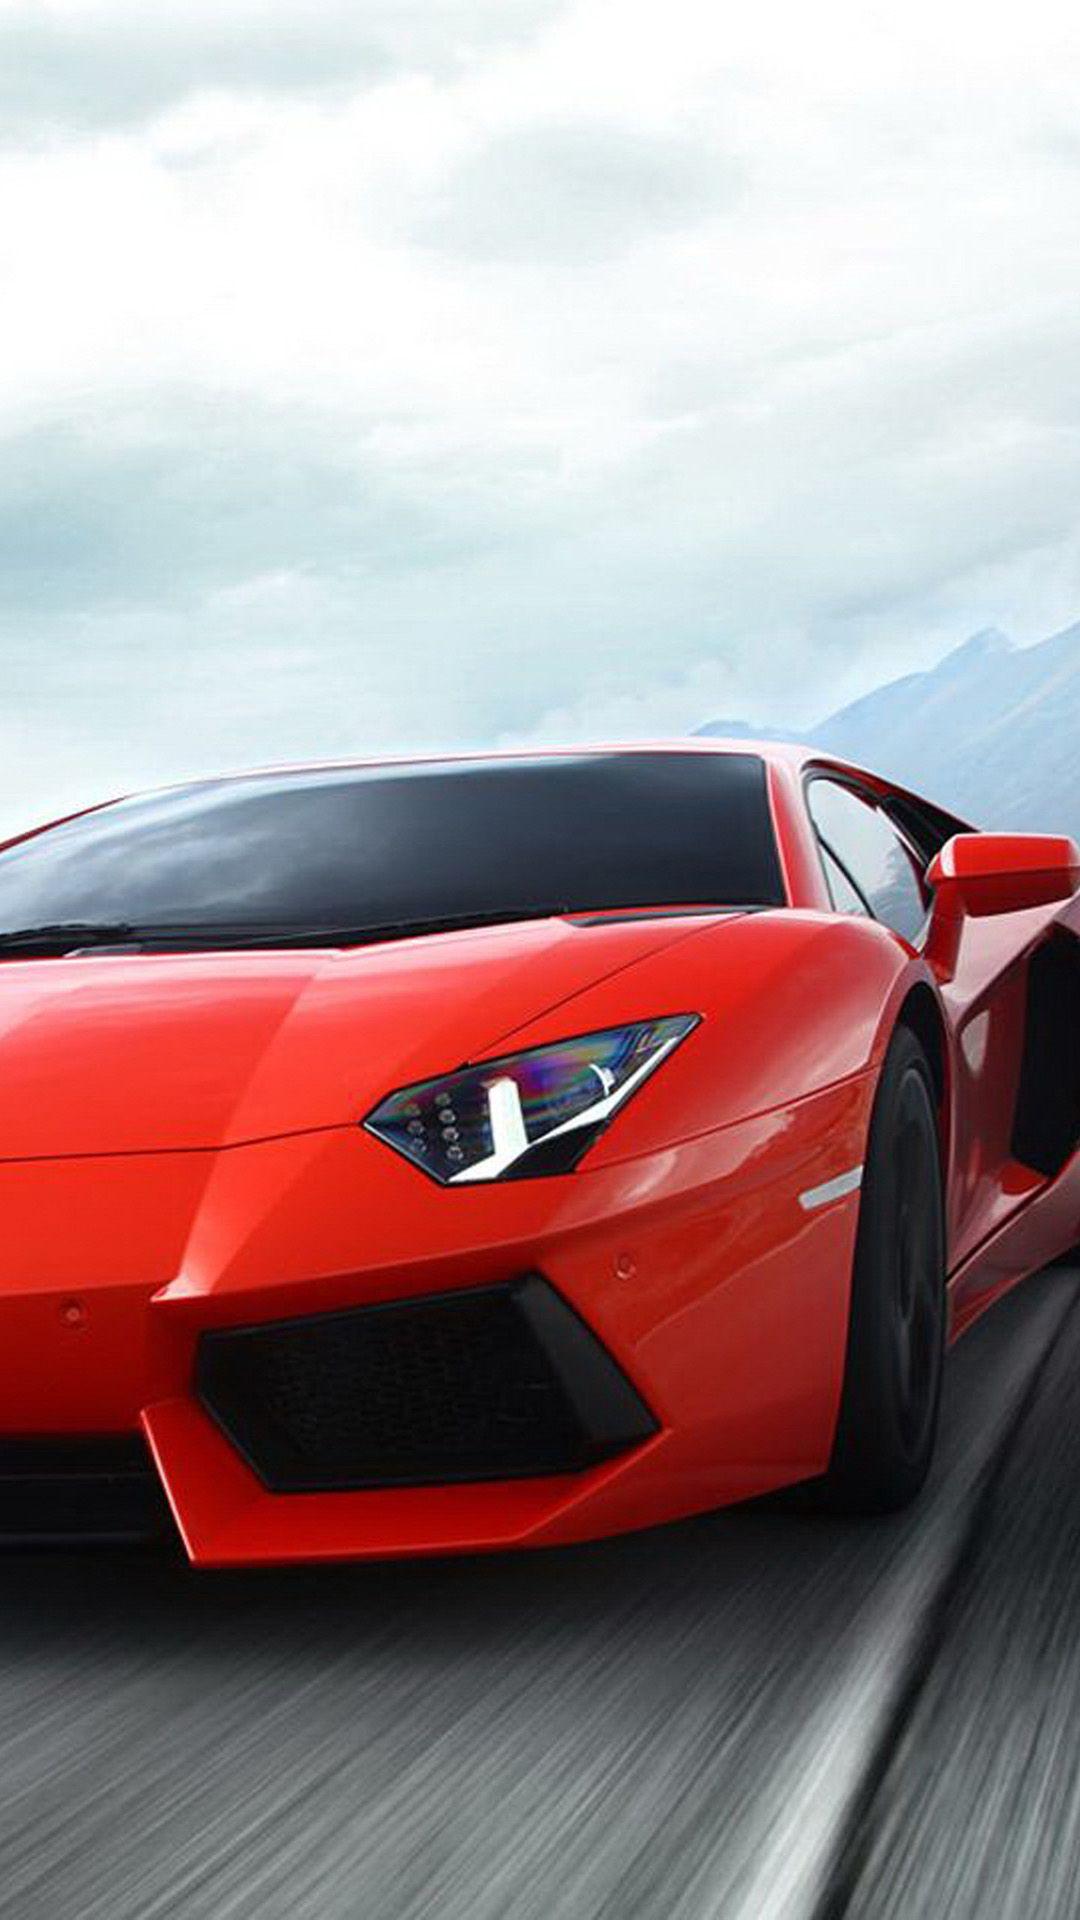 Red Lamborghini Wallpaper > - Sport Car Hd Wallpaper Phone , HD Wallpaper & Backgrounds